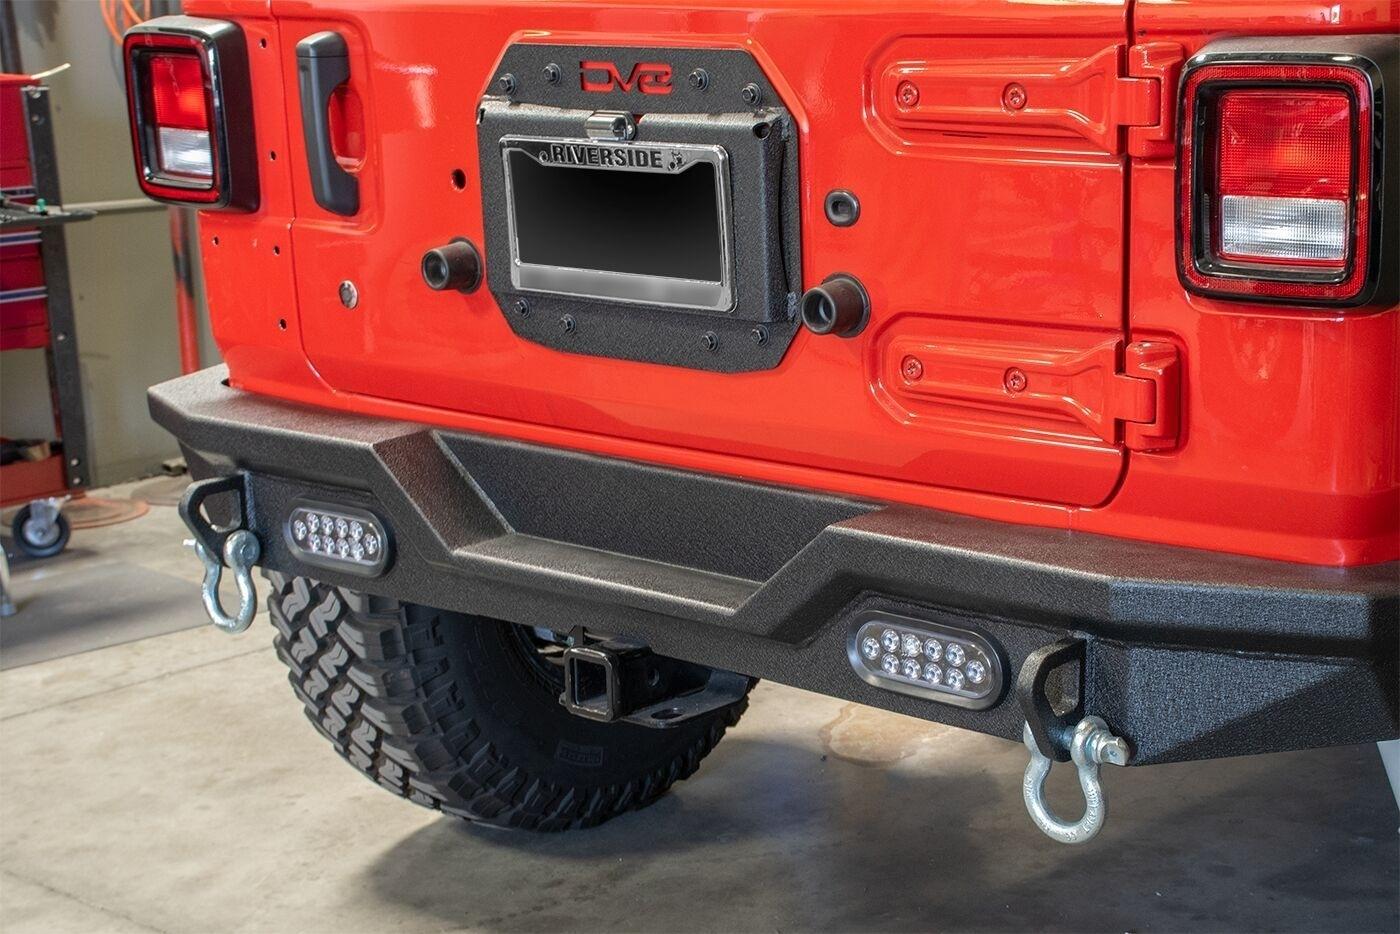 DV8 OFFROAD - Tire Carriers - DV8 JLTS-01